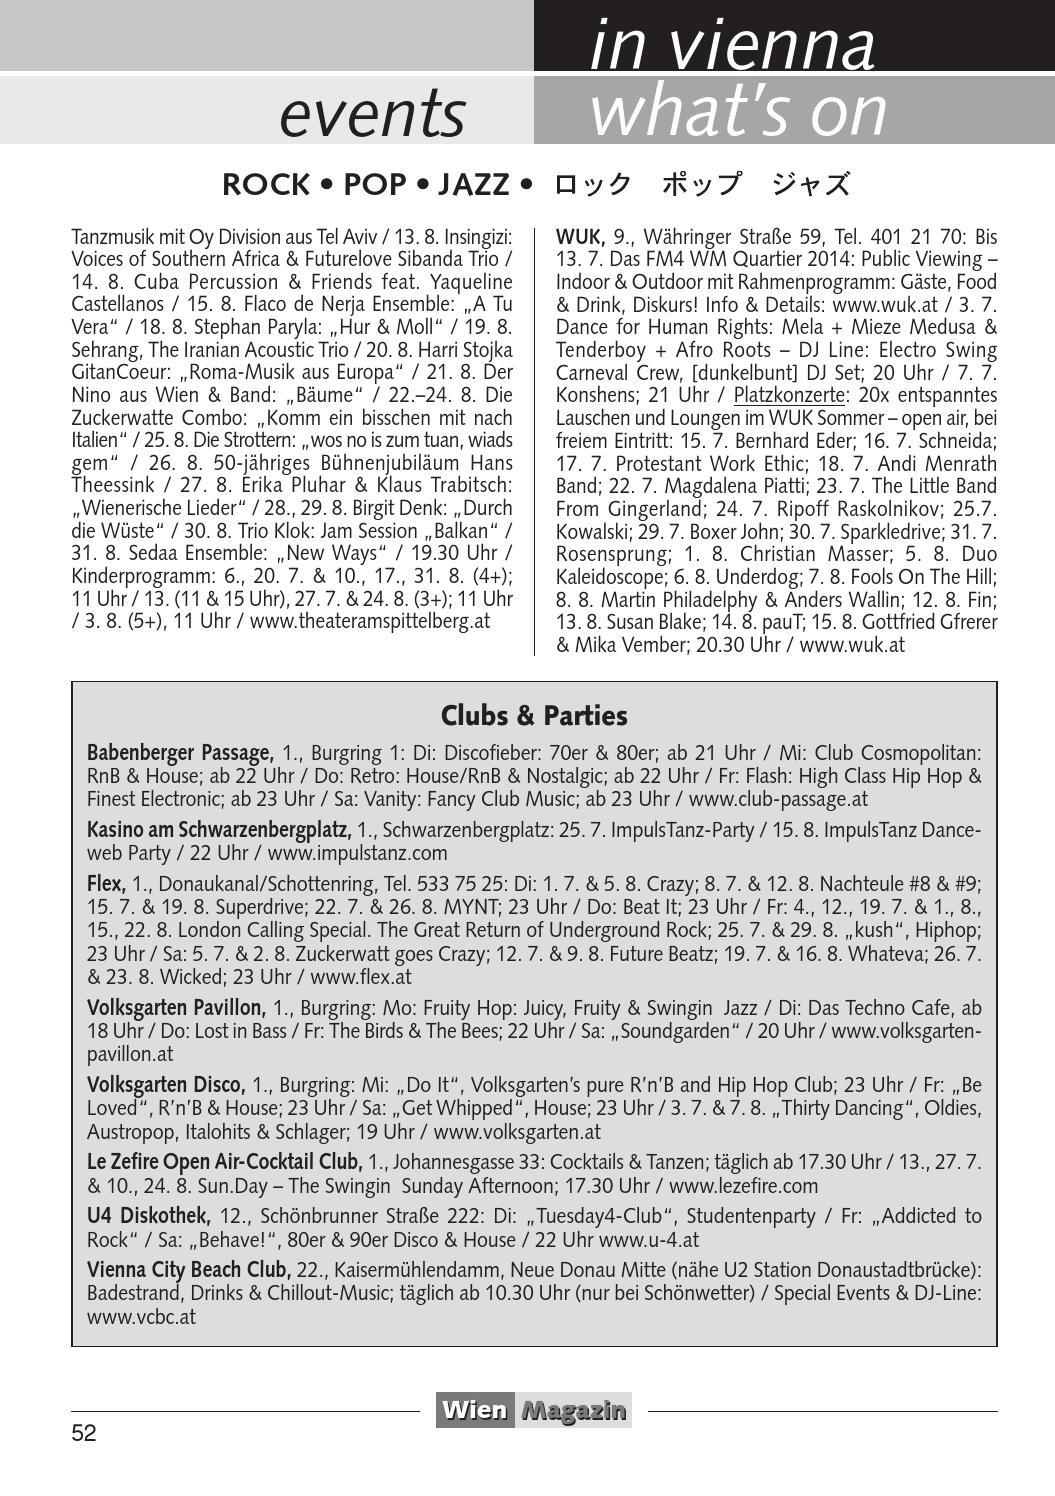 Wien Magazin 8/8 8 by Waltraud Edelmayer   issuu